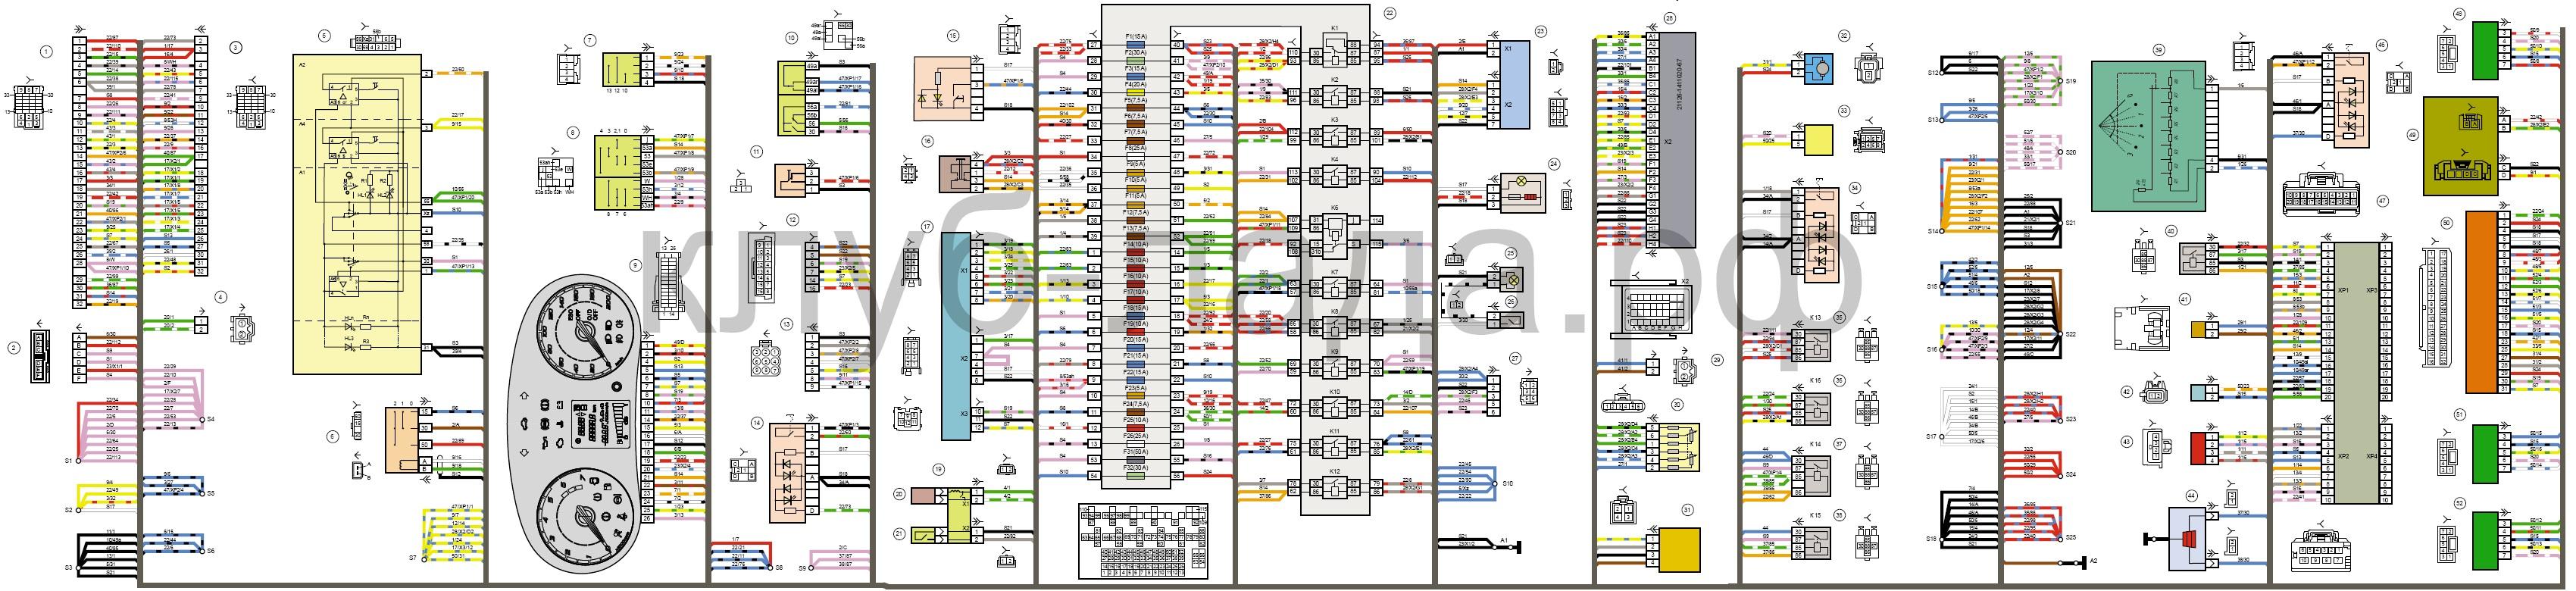 Схема комбинации приборов гранта